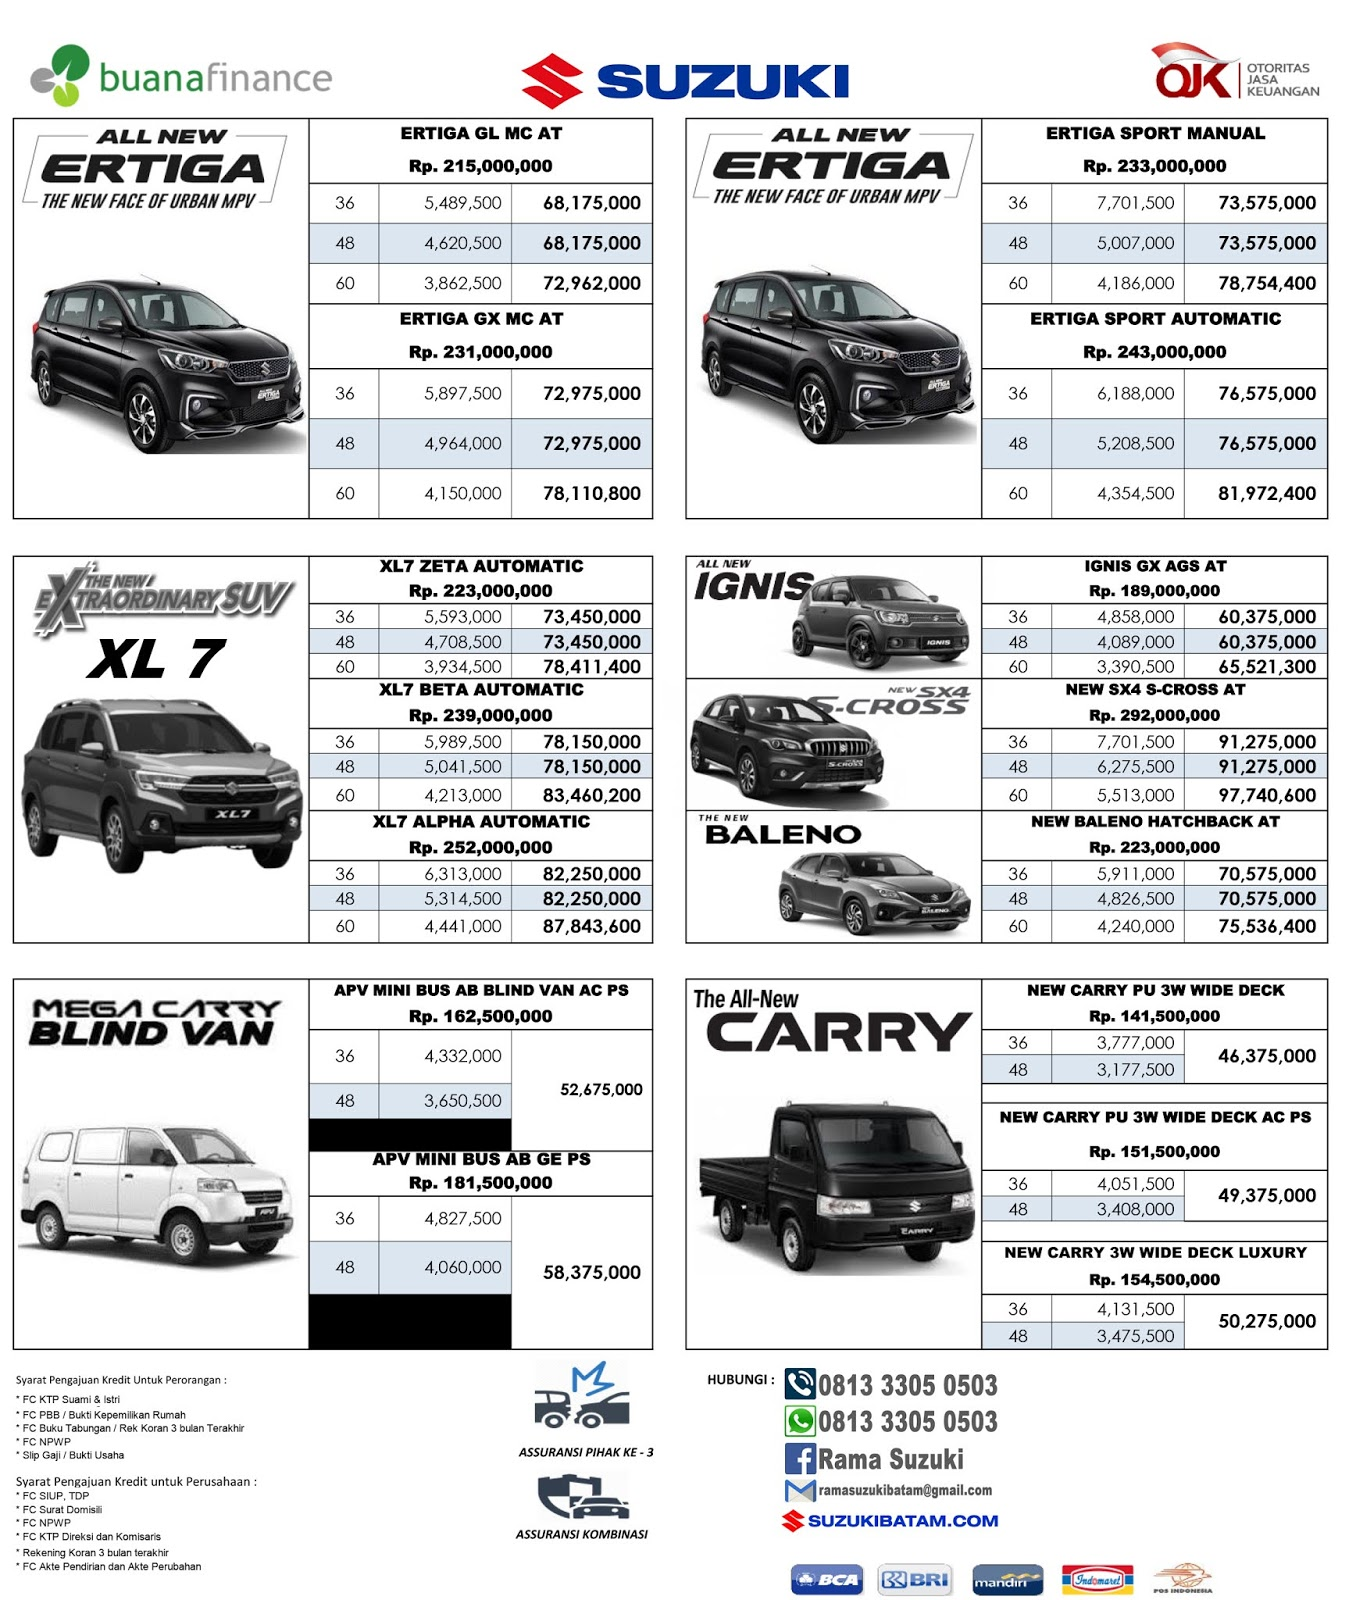 Harga Kredit Mobil Suzuki Batam Mei 2020 Buana Finance Dealer Resmi Mobil Suzuki Batam